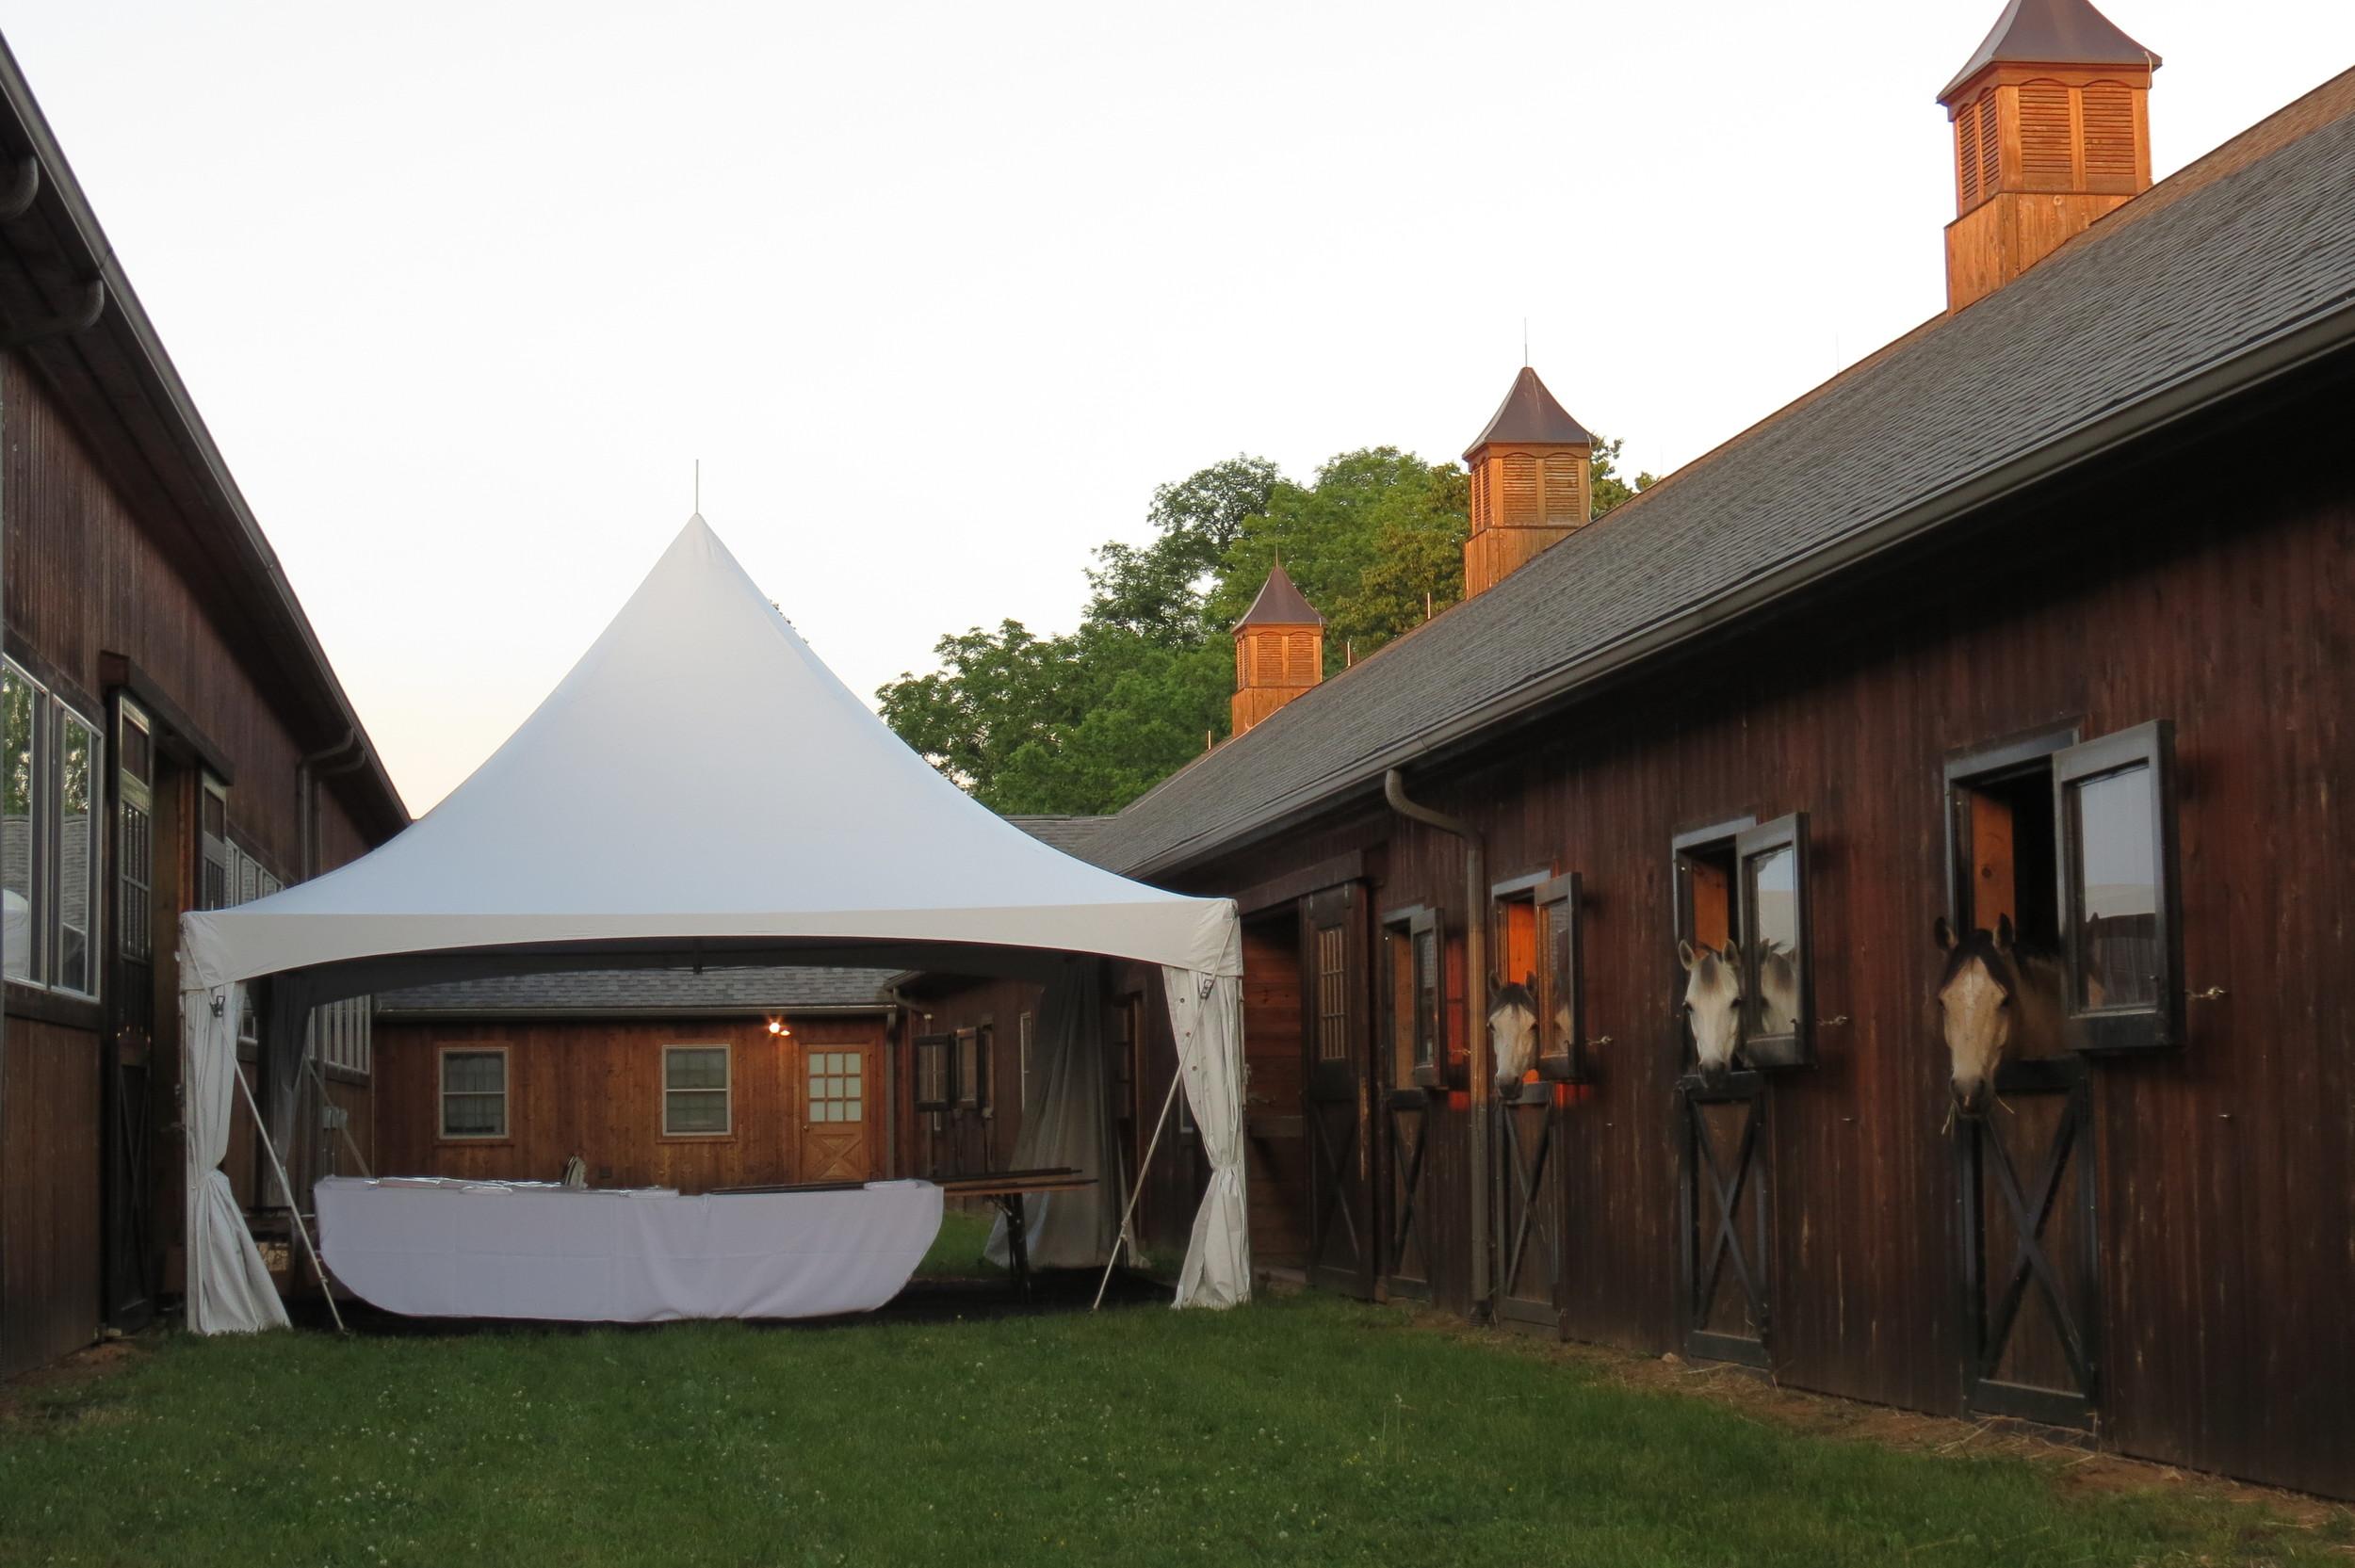 Small tent rentals in Delaware